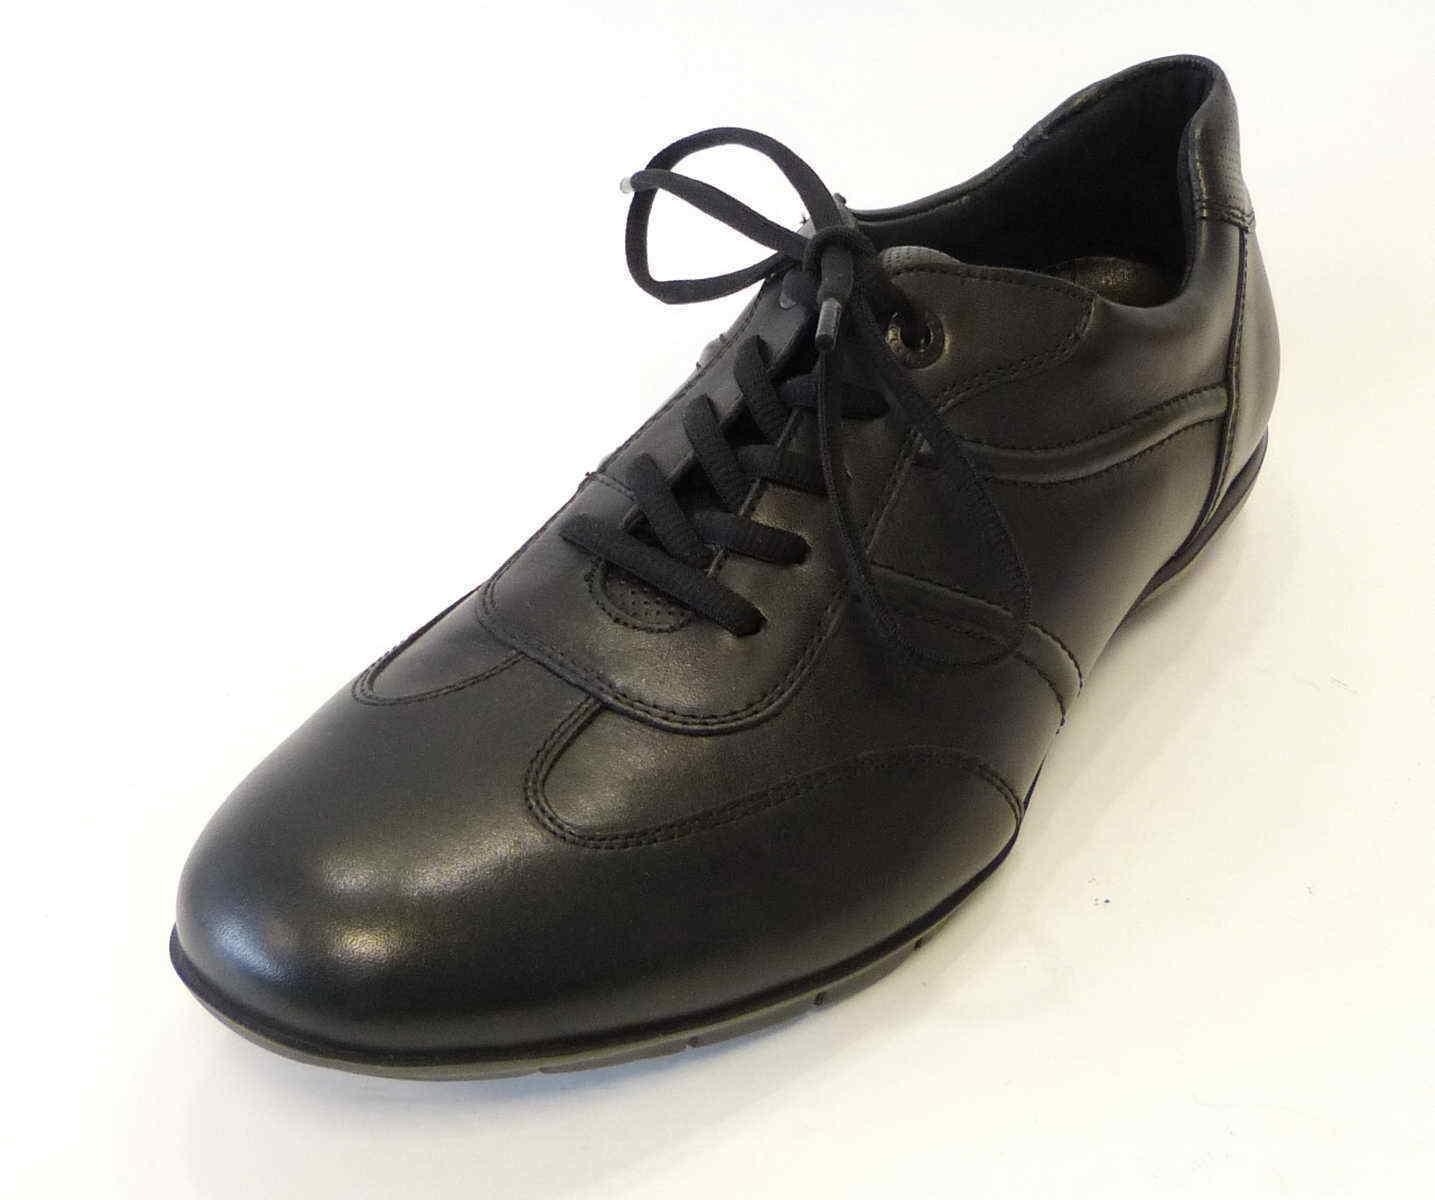 Lloyd Sneaker Armin schwarz 17022 10 Leder Edel Sport Schuhe